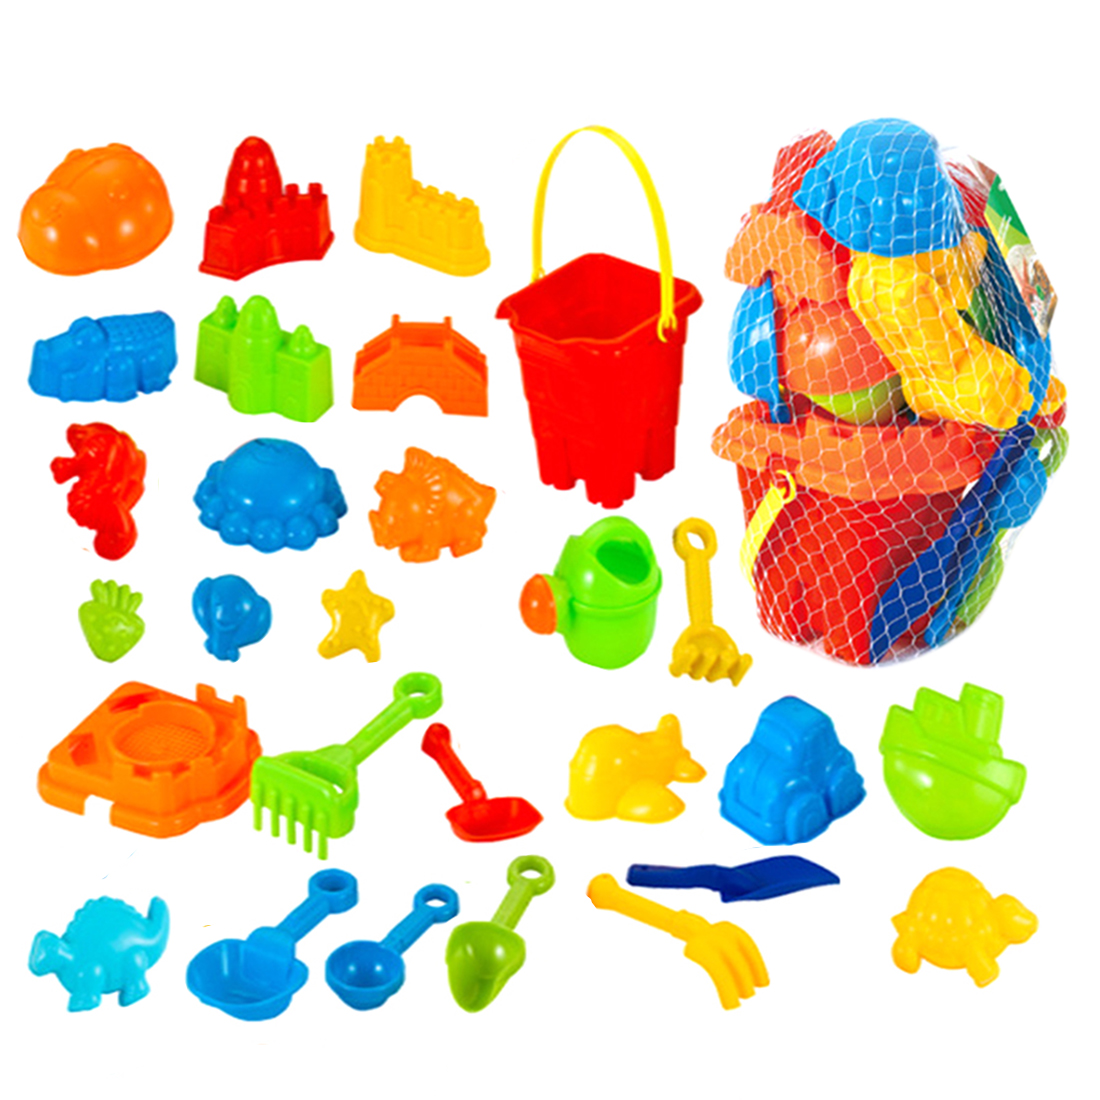 Toys & Hobbies 28pcs/set Children Outdoor Summer Beach Sand Toy Playset With Mesh Bag Outdoor Fun In Summer